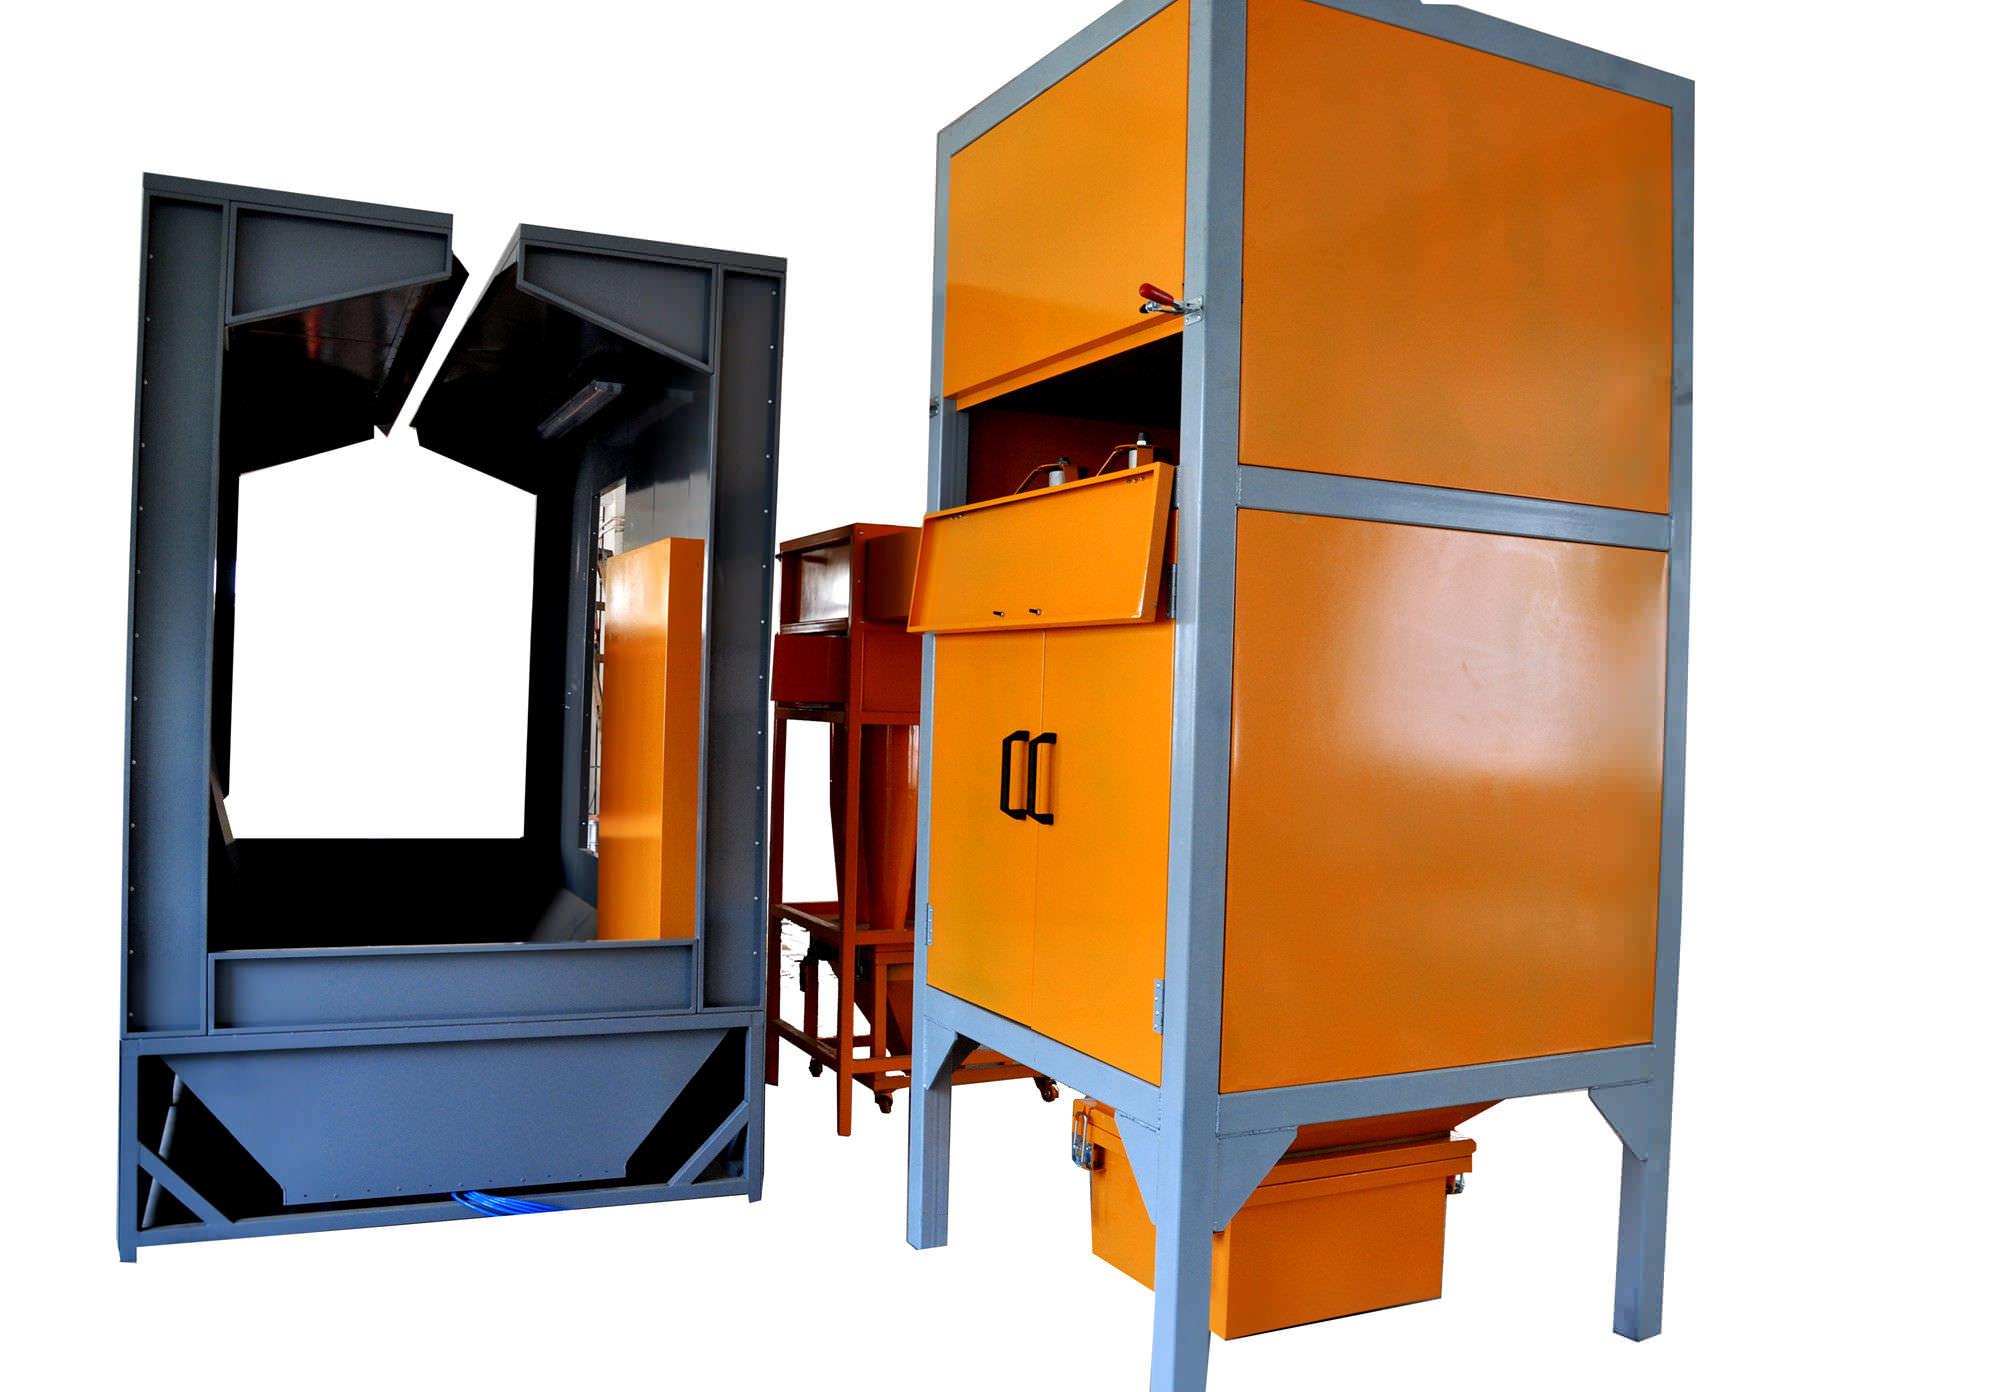 Cabina Armadio Tenda Polvere : Cabina armadio polvere. interesting presotto corner varius with